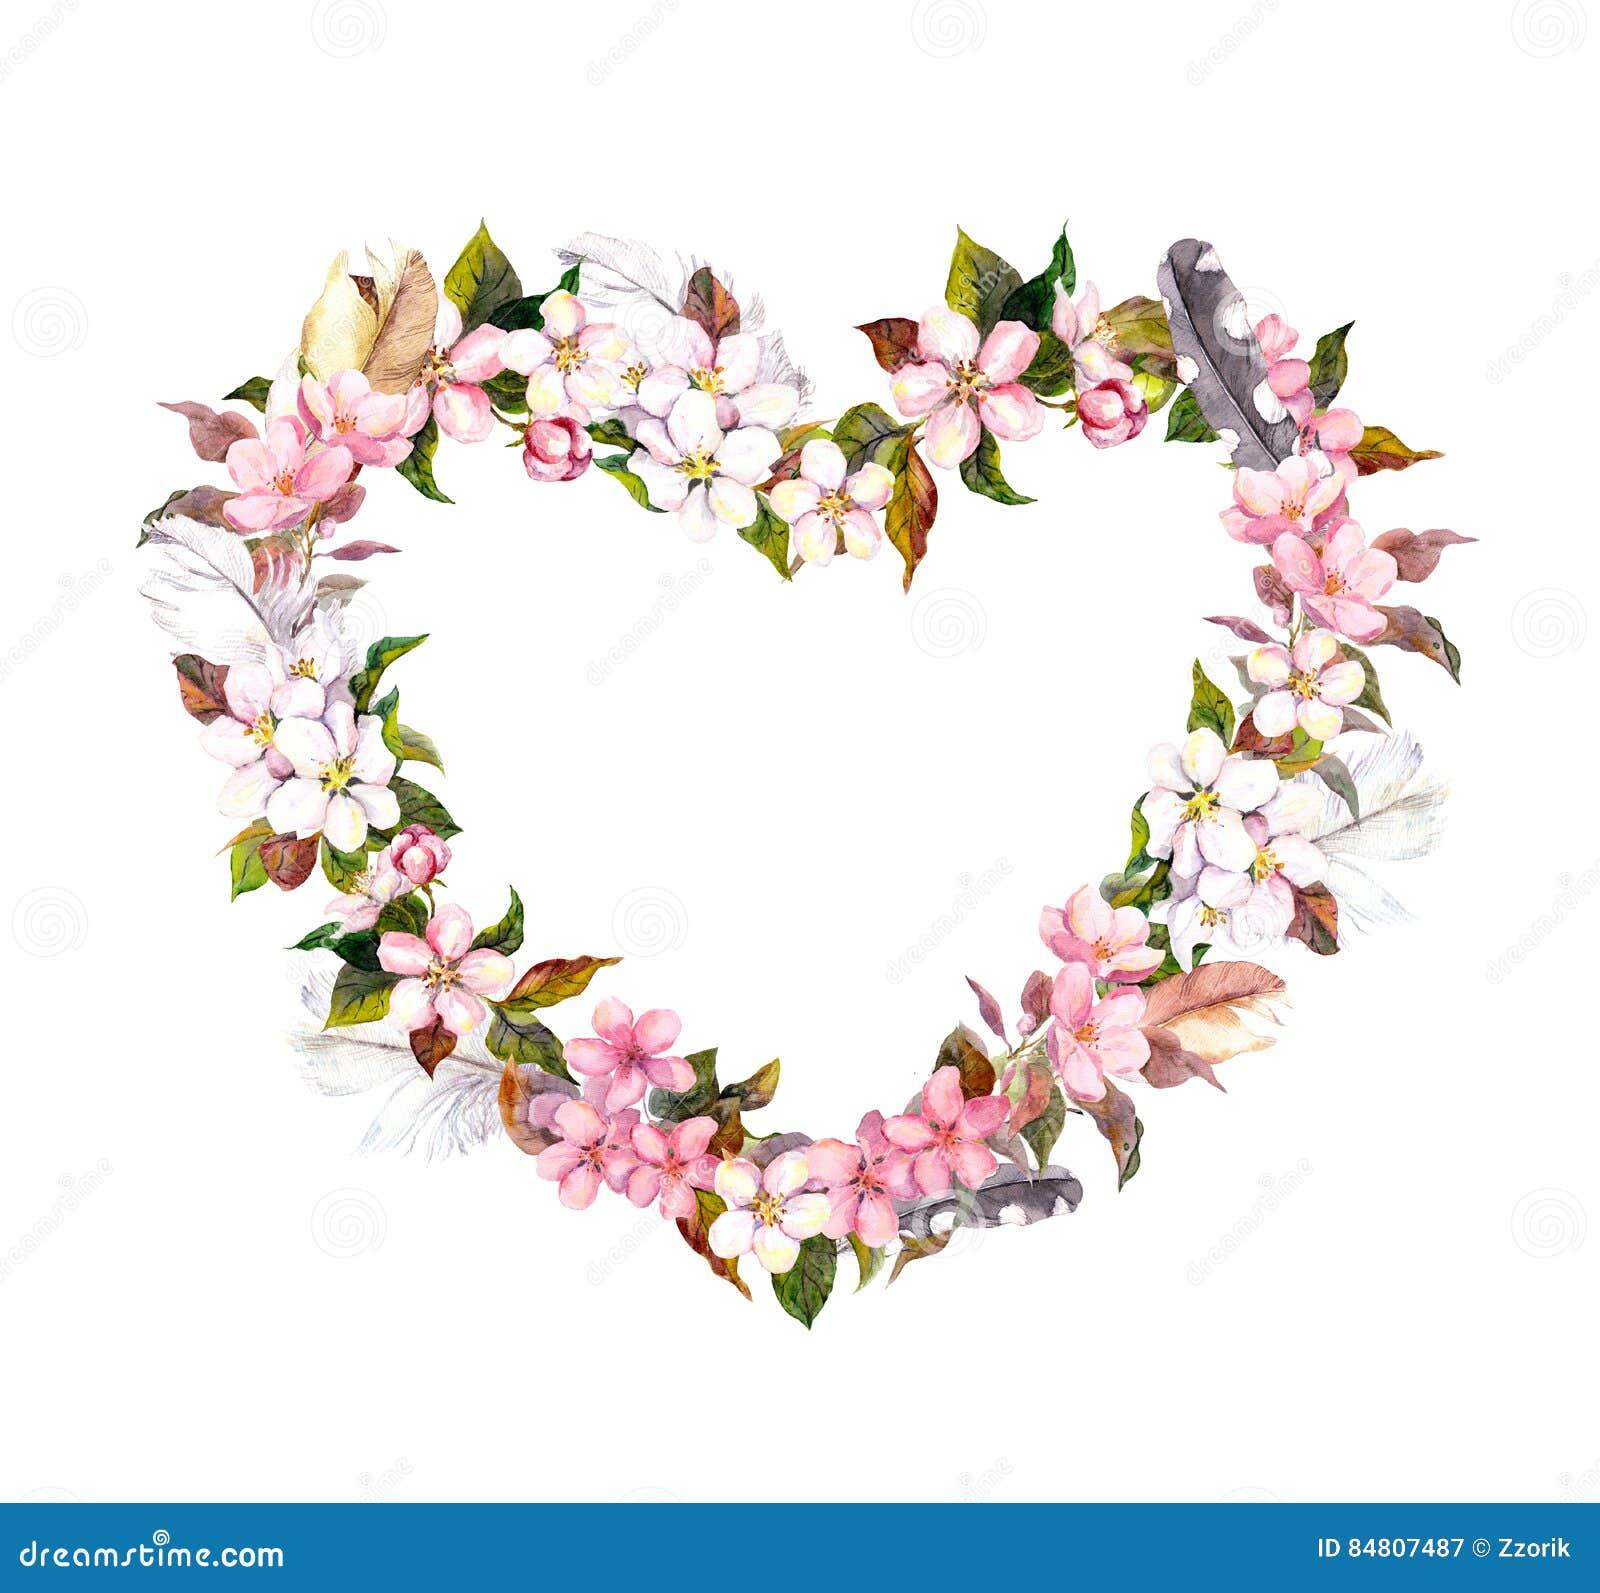 Floral στεφάνι - μορφή καρδιών Ρόδινα λουλούδια και φτερά Watercolor για την ημέρα βαλεντίνων, γάμος στο εκλεκτής ποιότητας ύφος